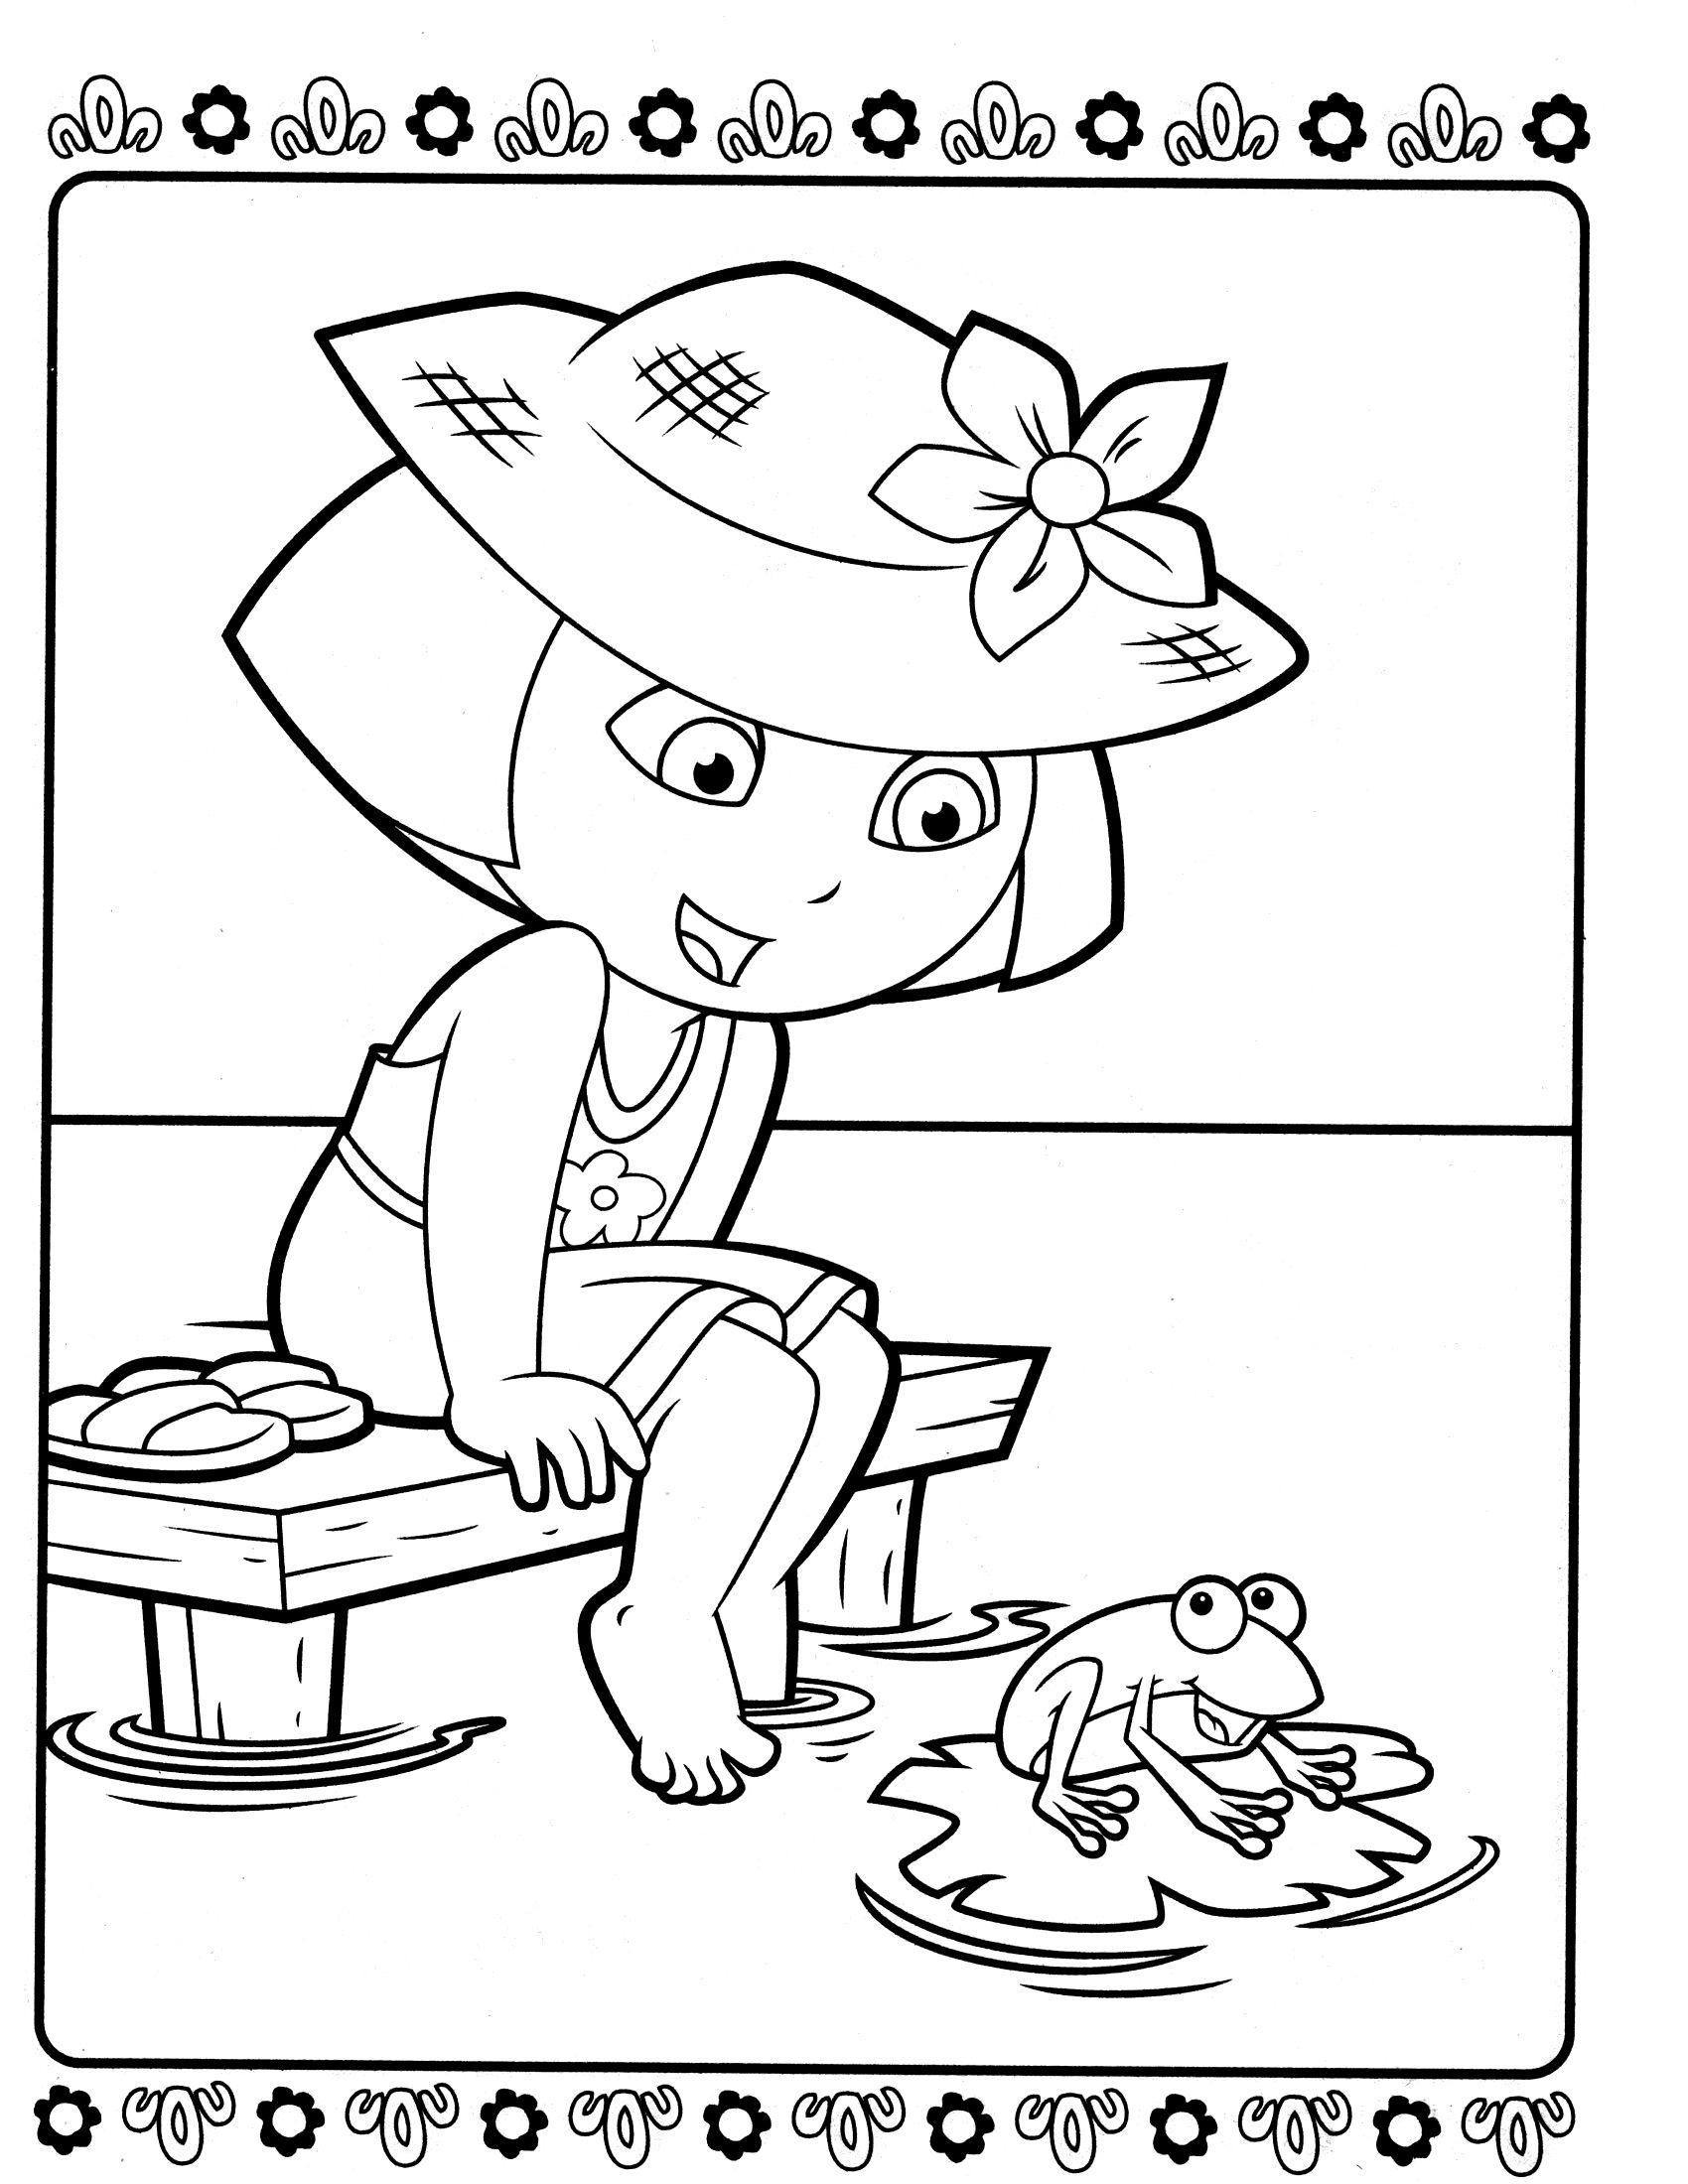 Dora 94 Coloringcolor Com Frog Coloring Pages Bear Coloring Pages Coloring Pages [ 2200 x 1700 Pixel ]